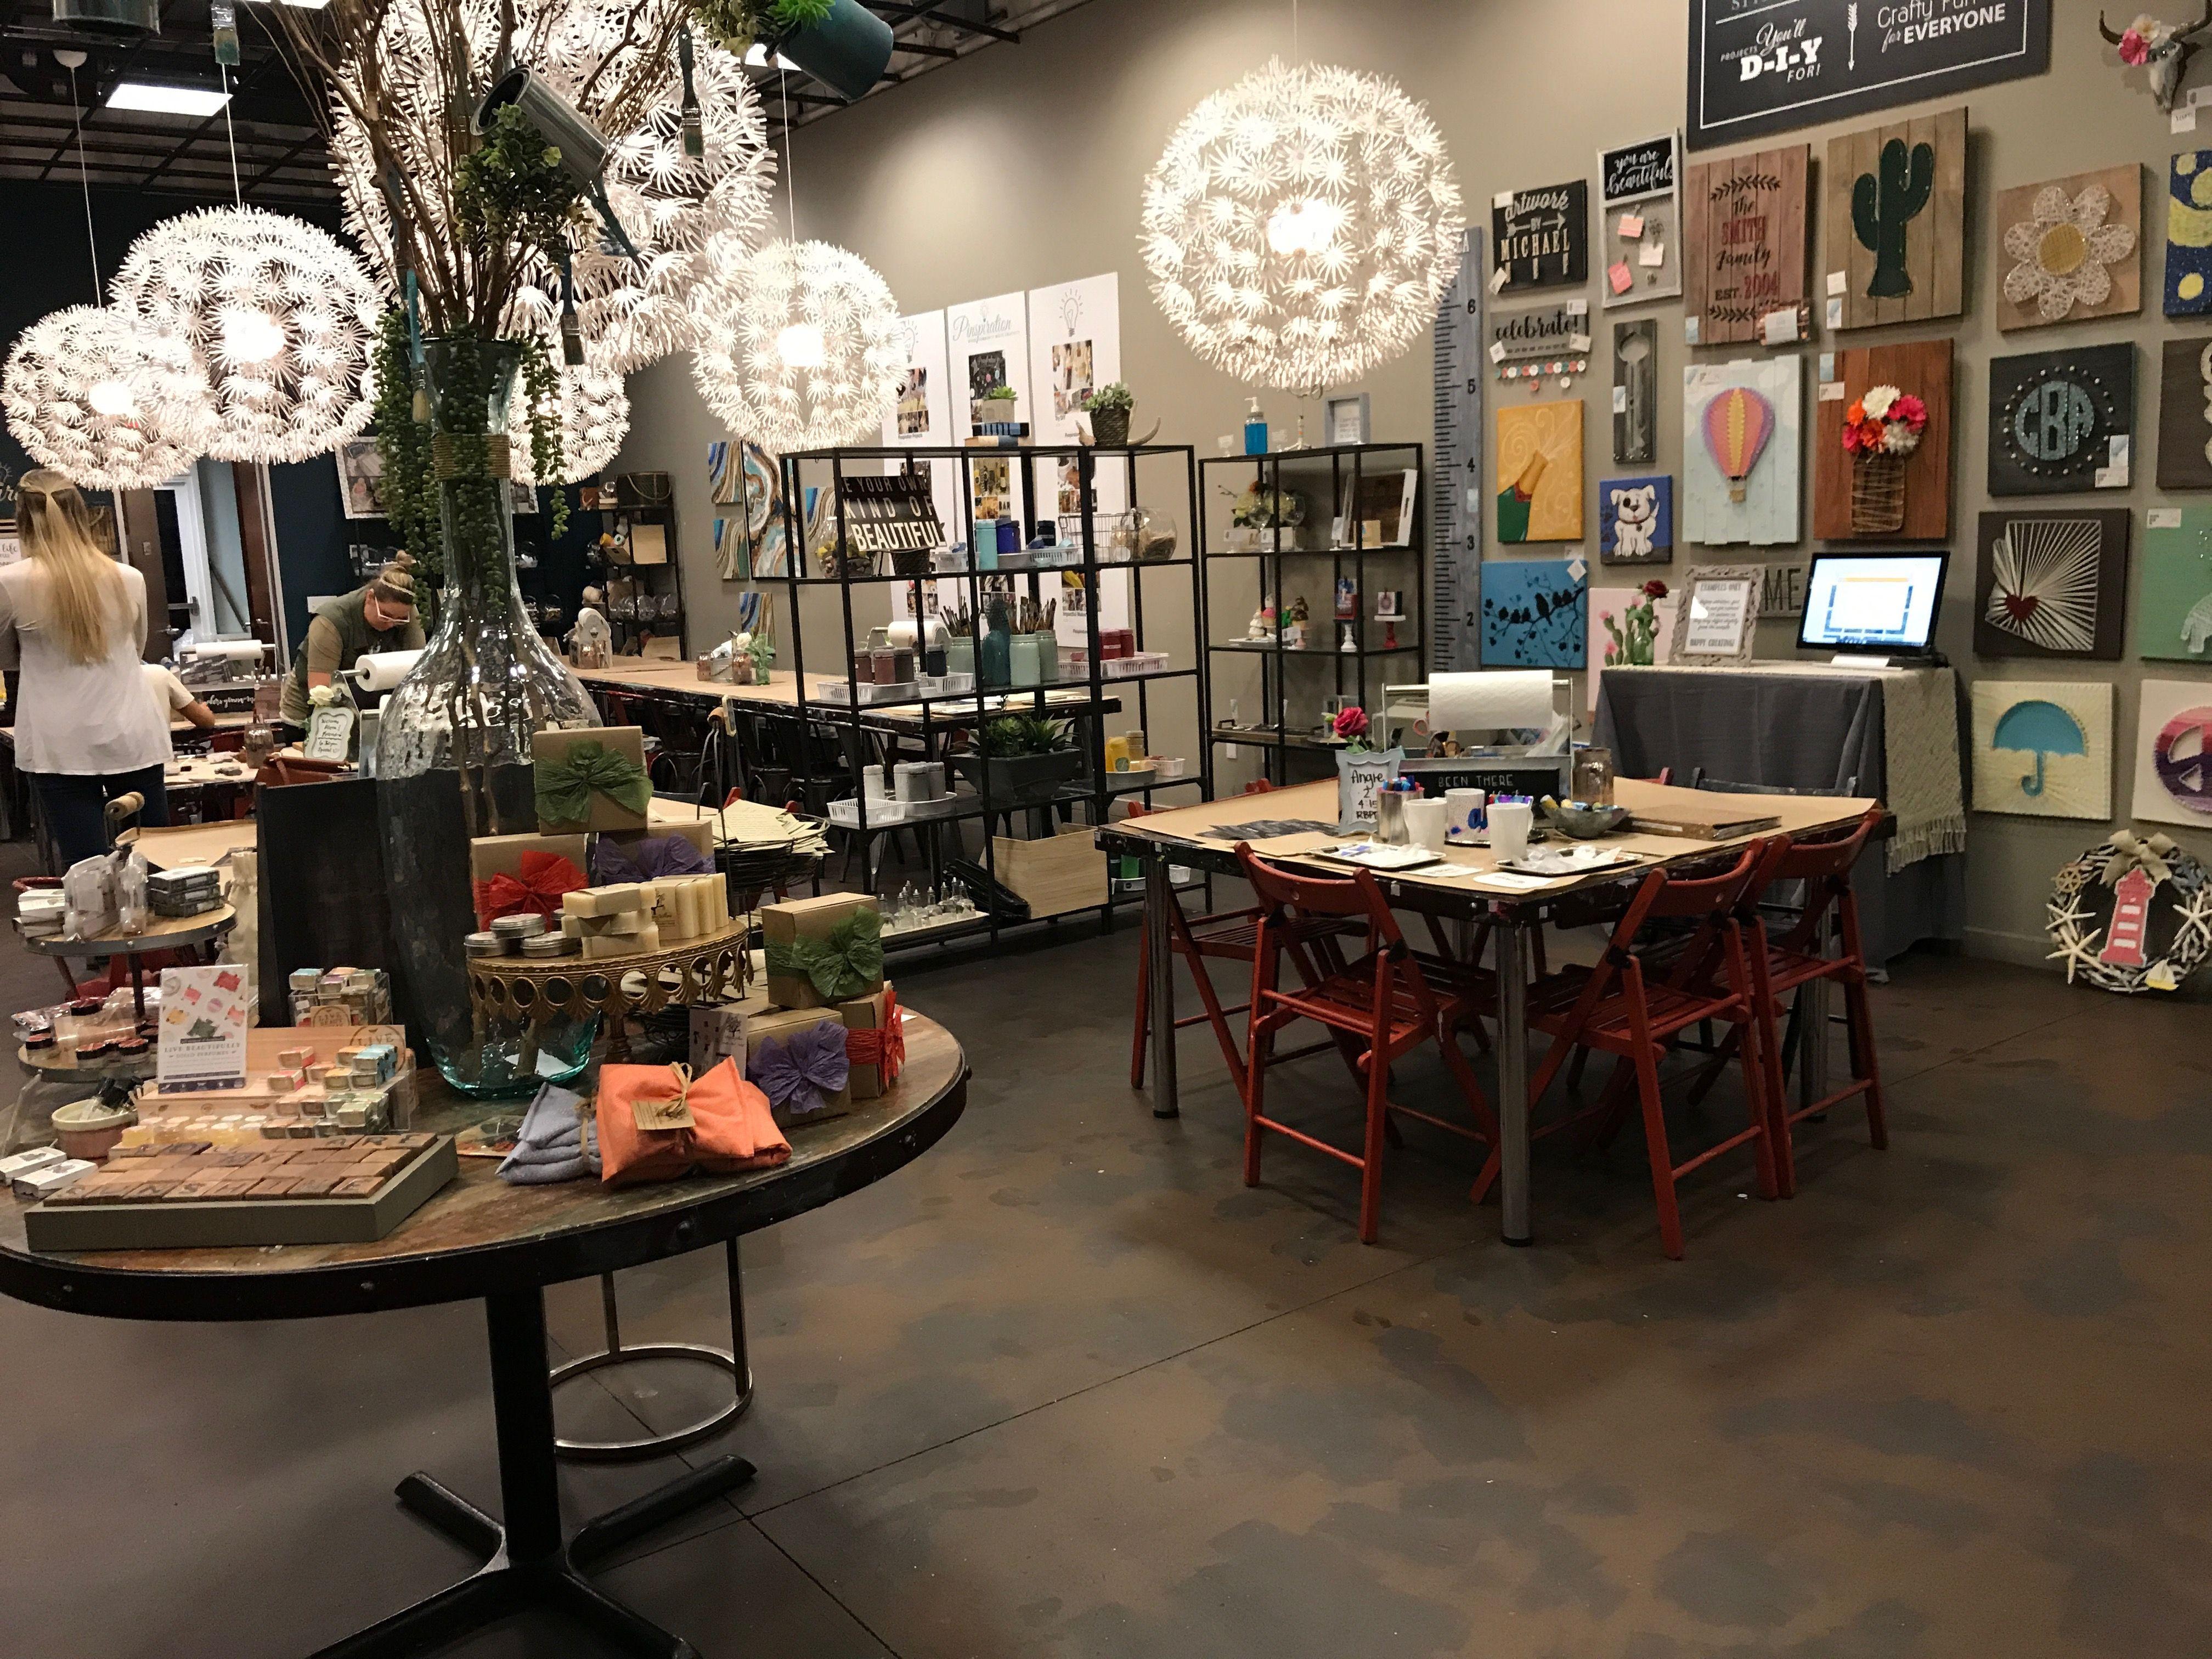 Handmade local retail where community meets creativity